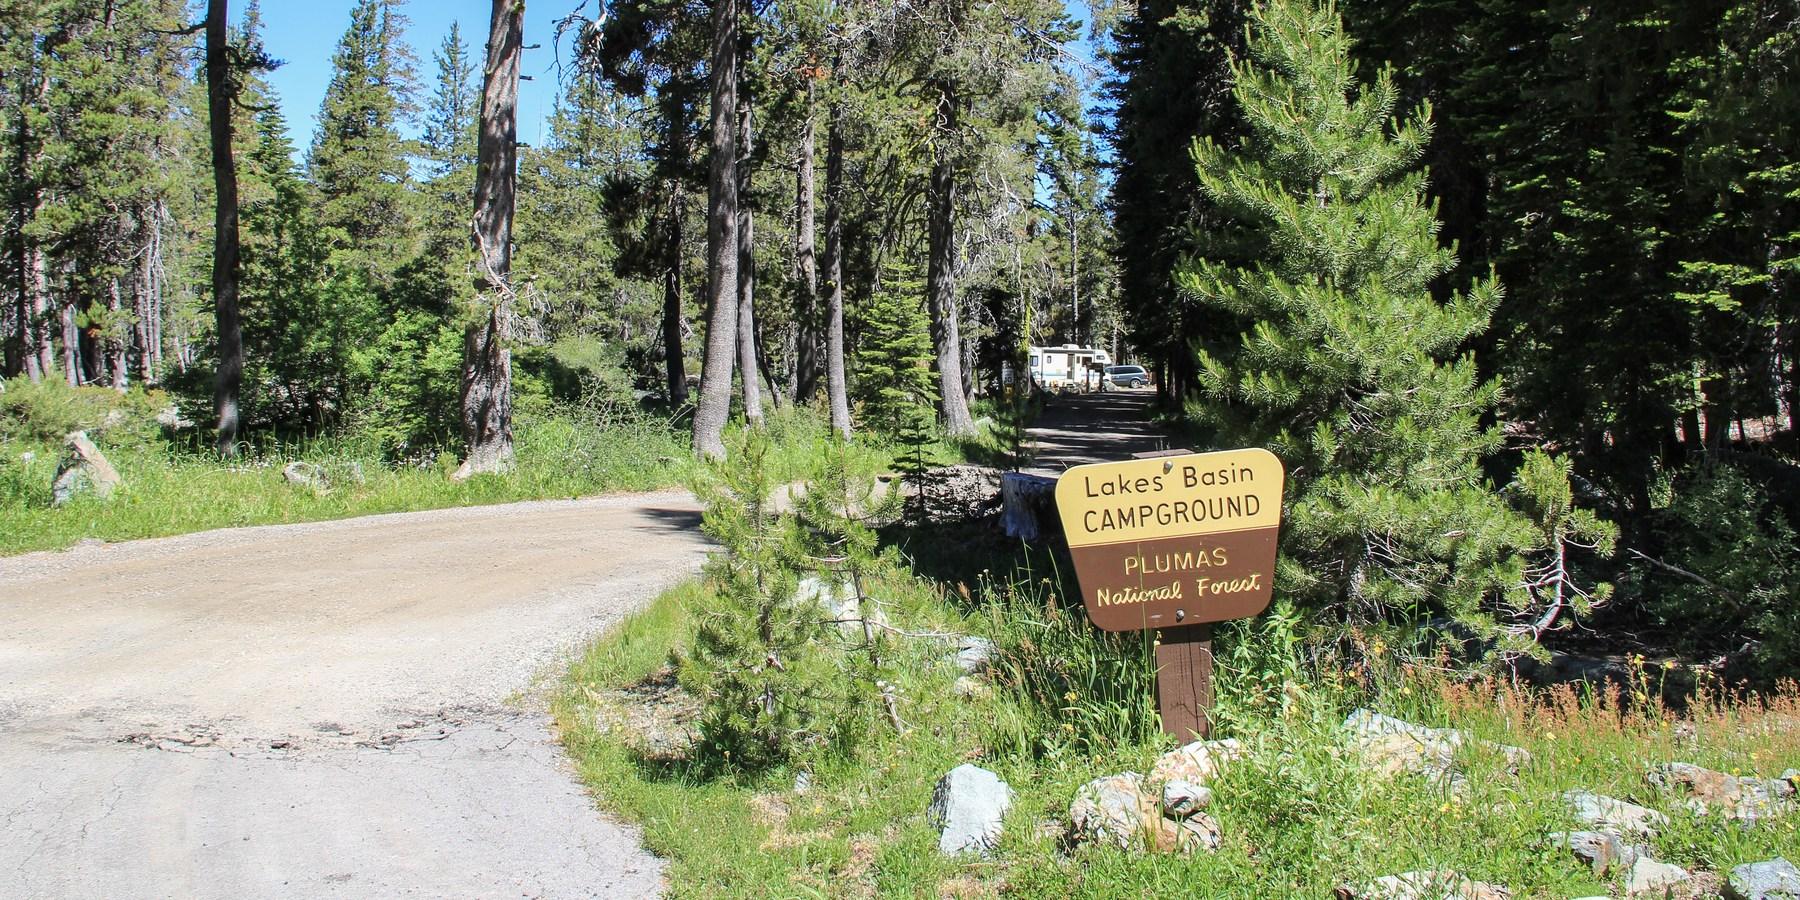 Lakes Basin Campground - camping in California